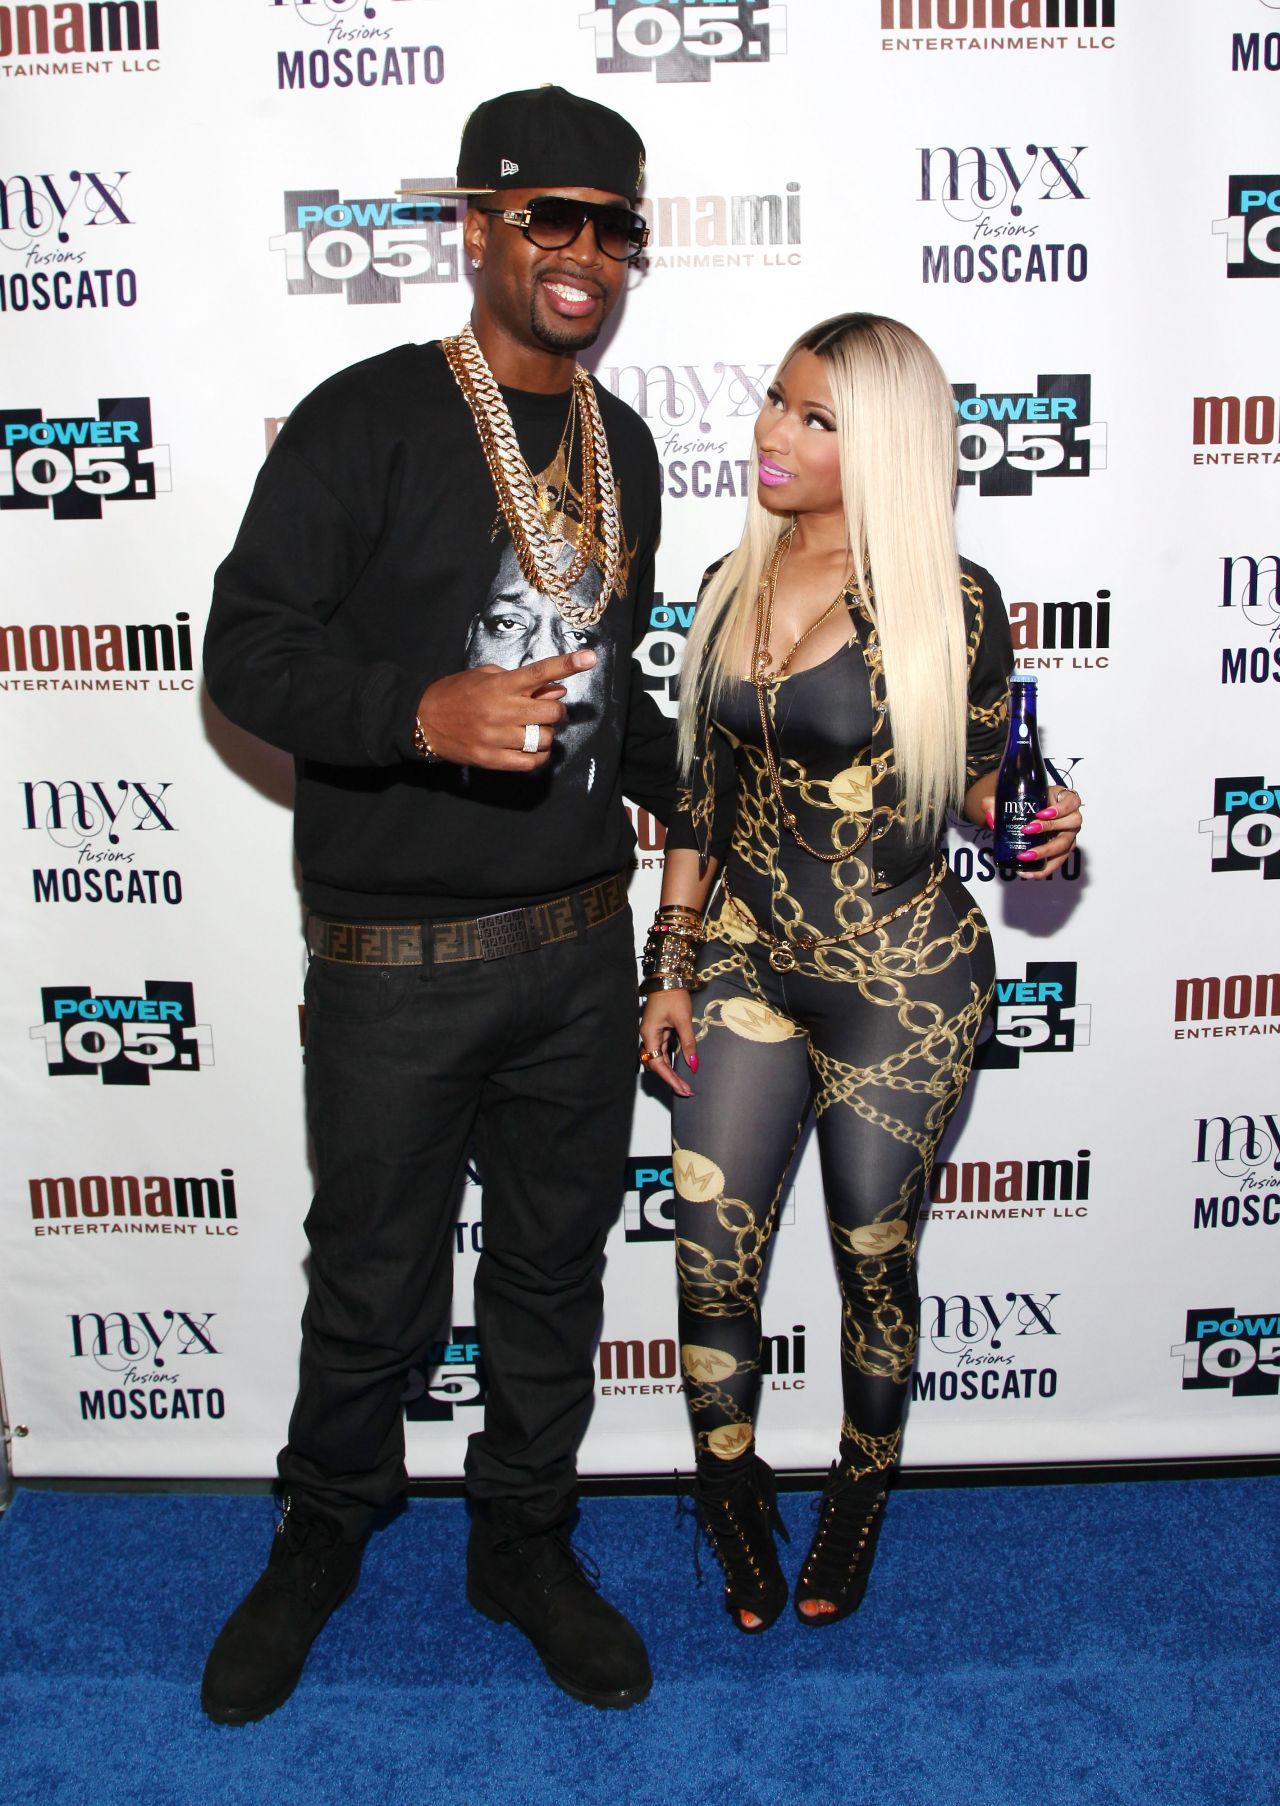 Nicki Minaj in Skintight Printed Jumpsuit at Power105.1